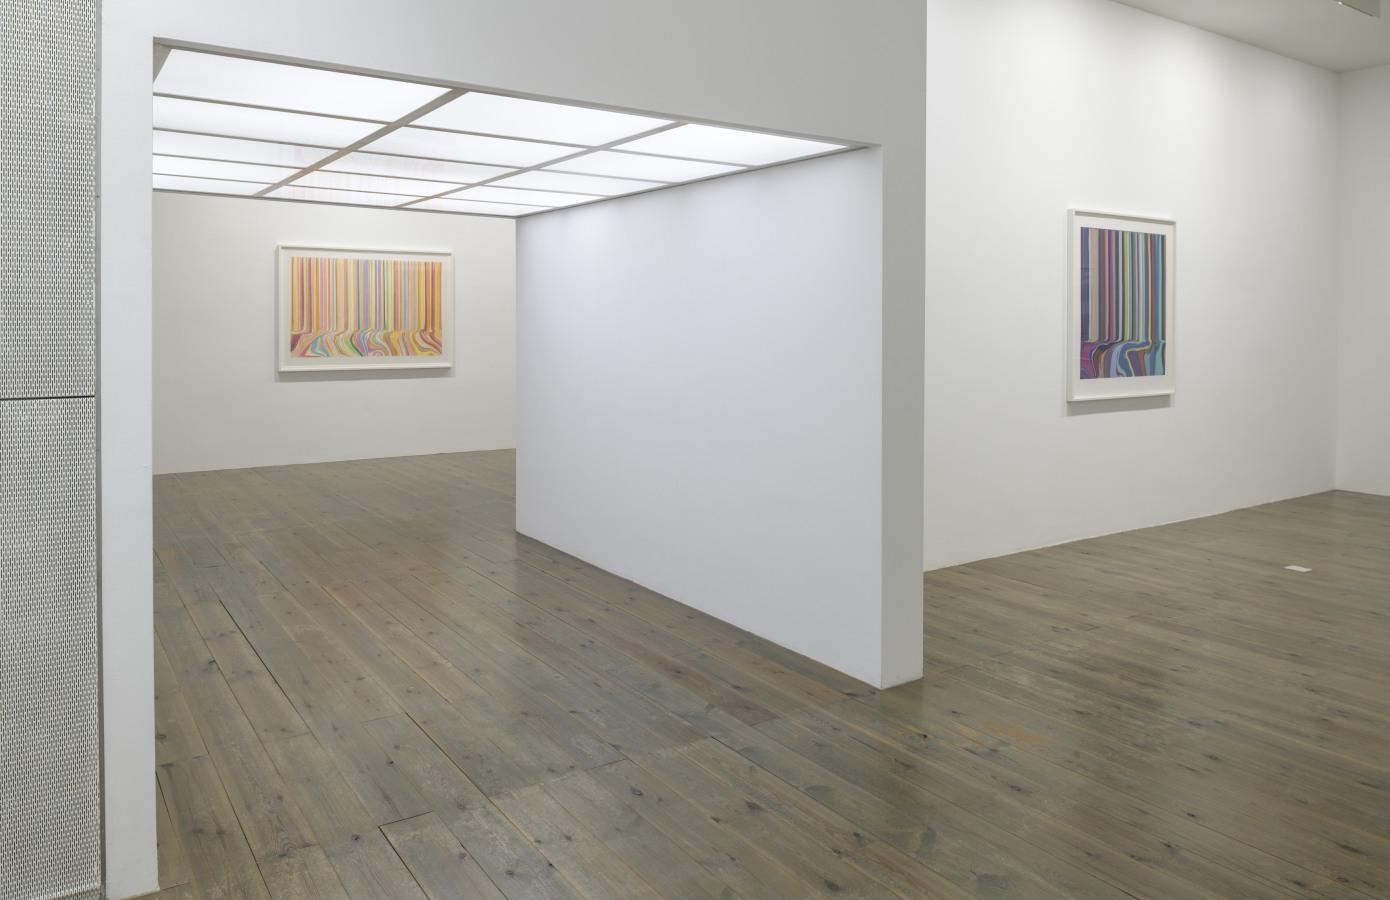 New Works on Paper, Ian Davenport, Paul Drissen,